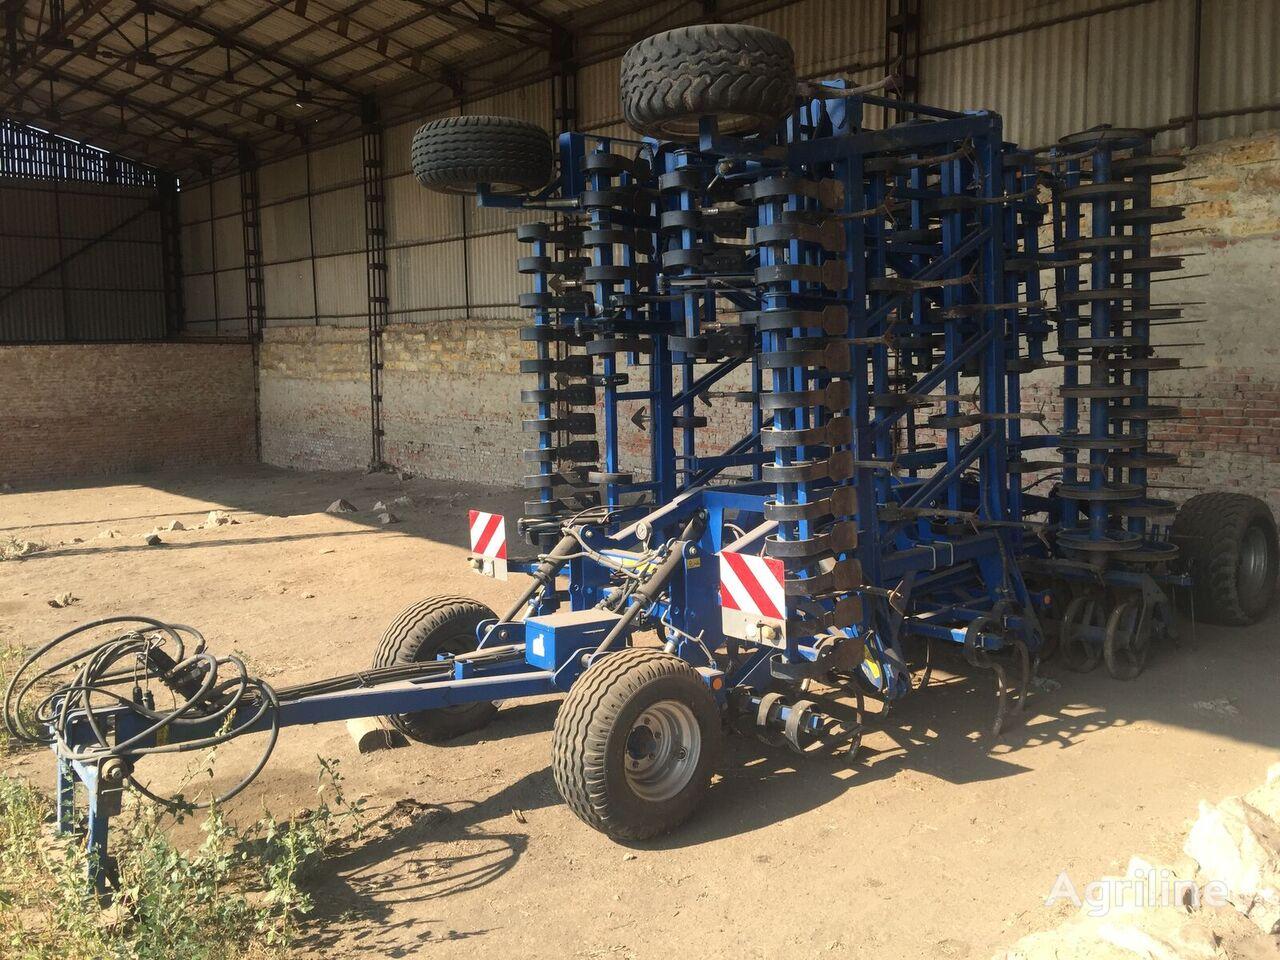 KÖCKERLING Allrounder 1200 stubble cultivator